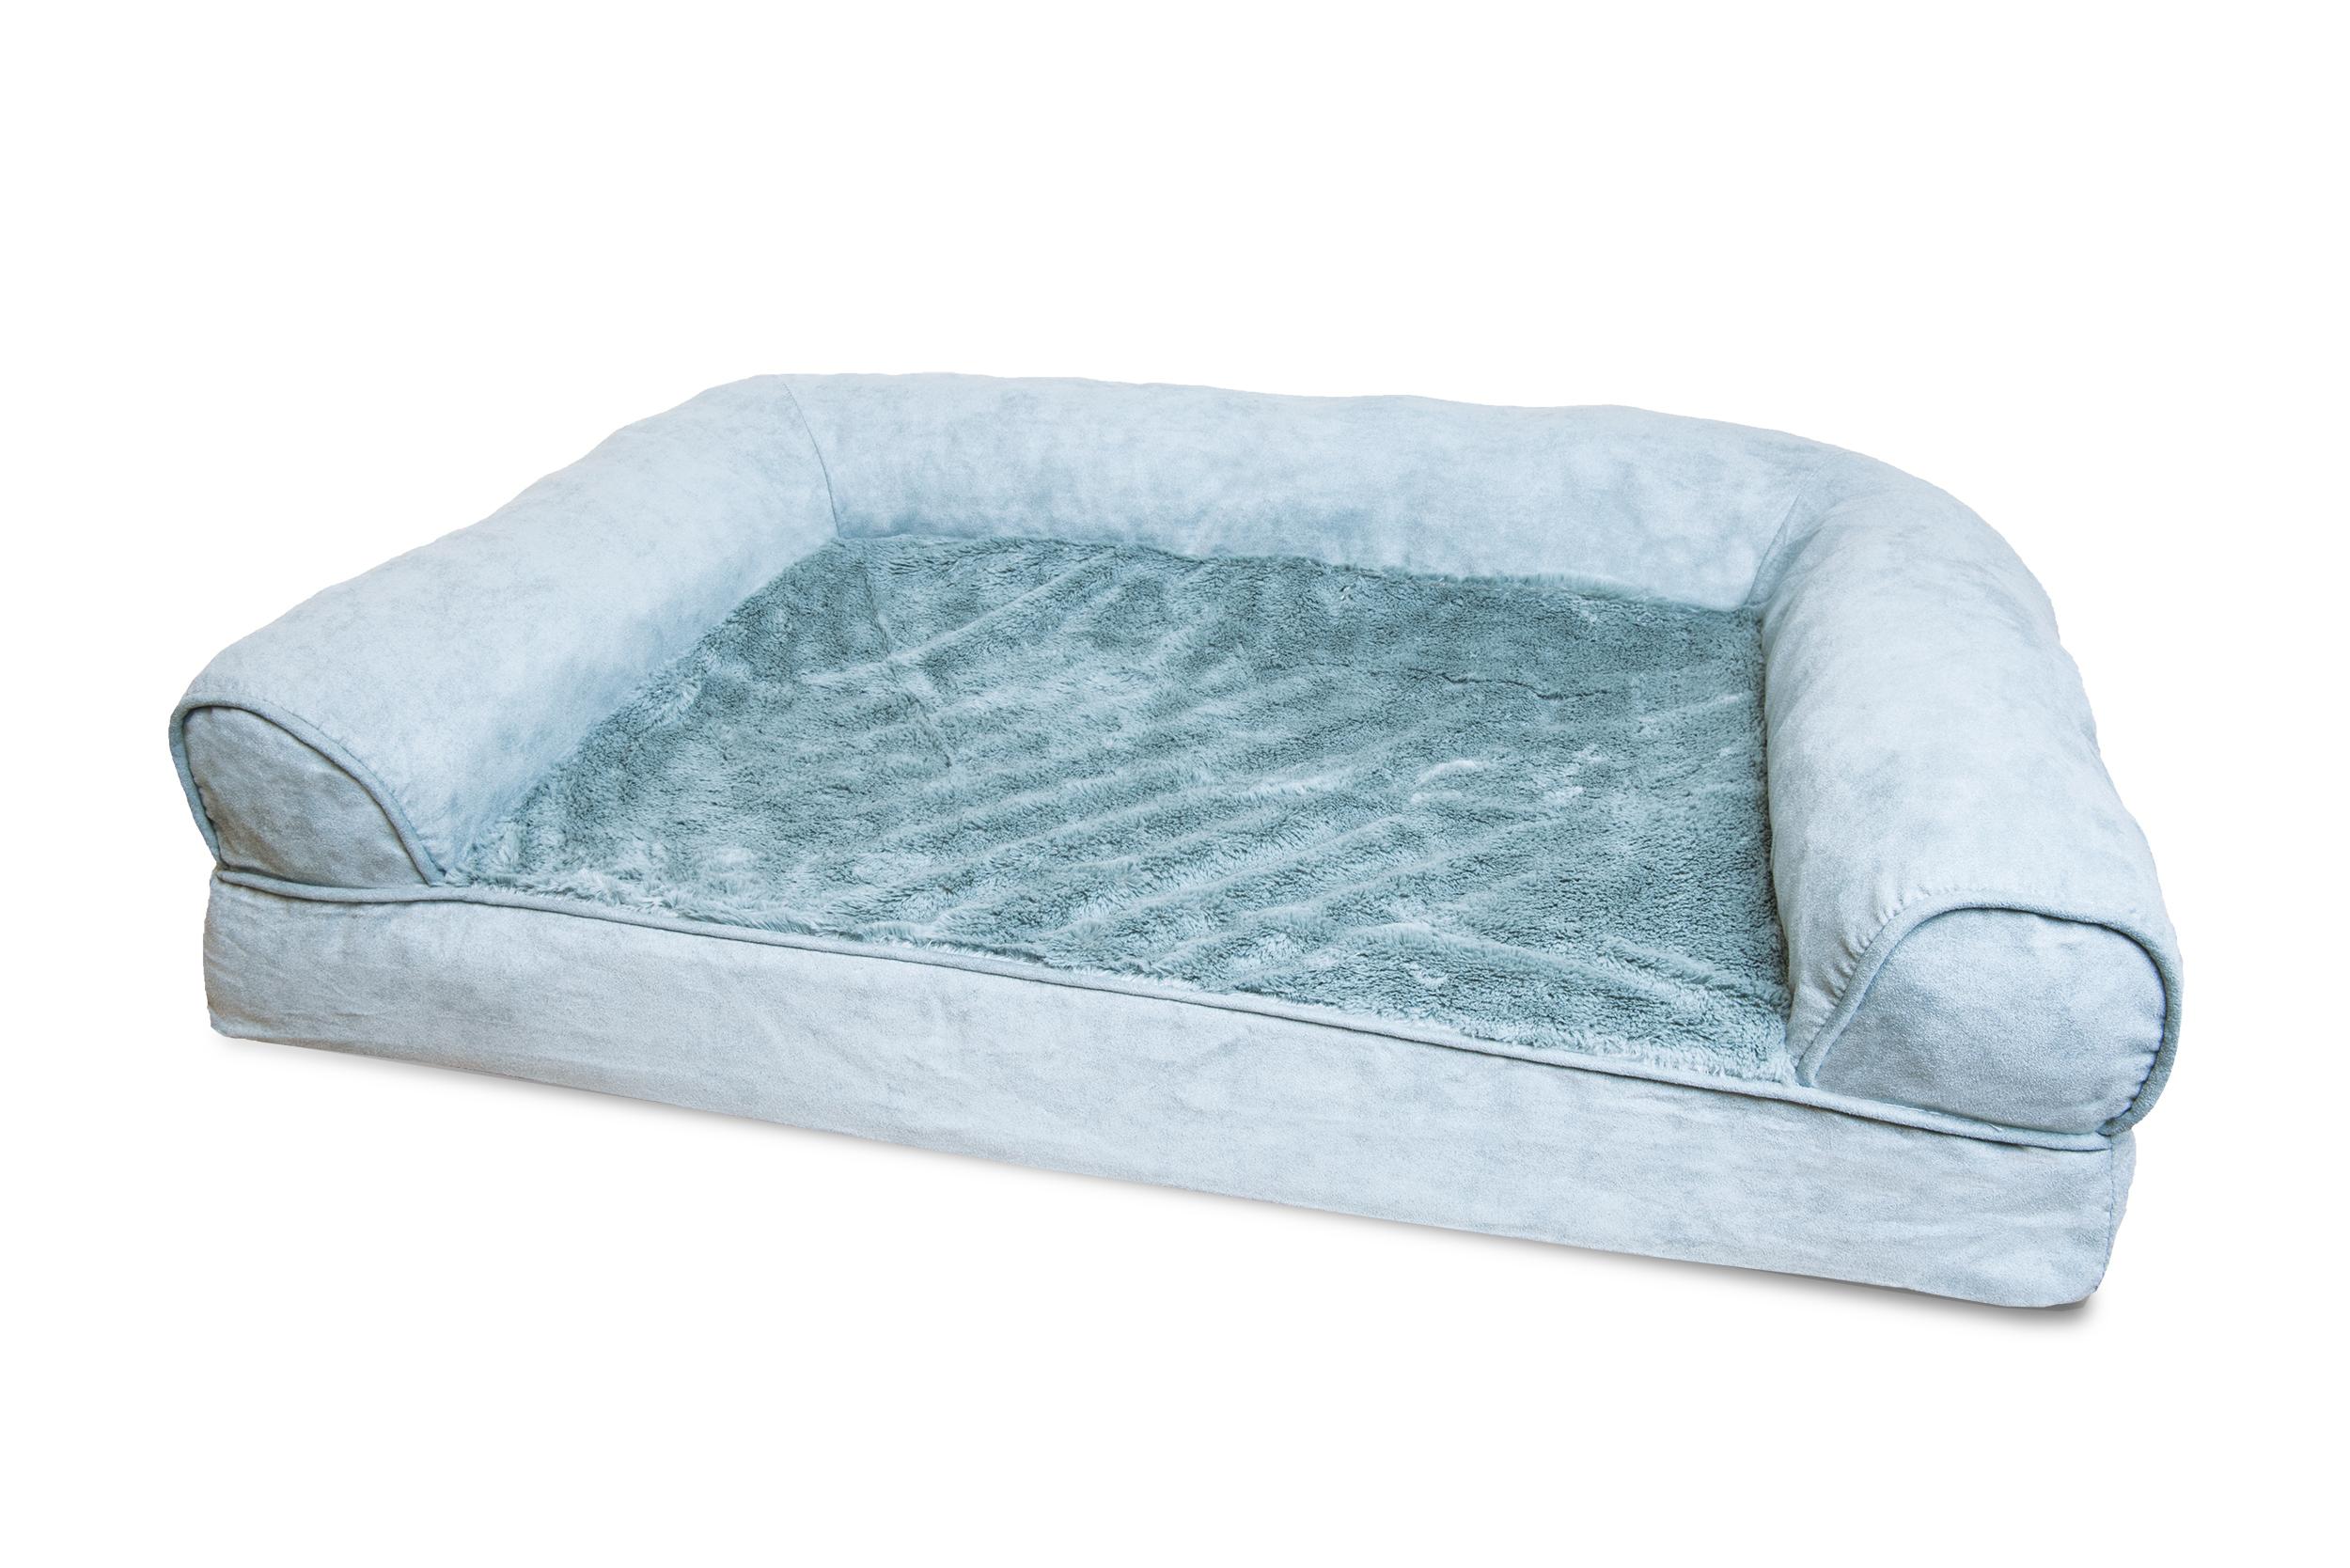 FurHaven Plush & Suede Orthopedic Sofa Dog Bed Pet Bed